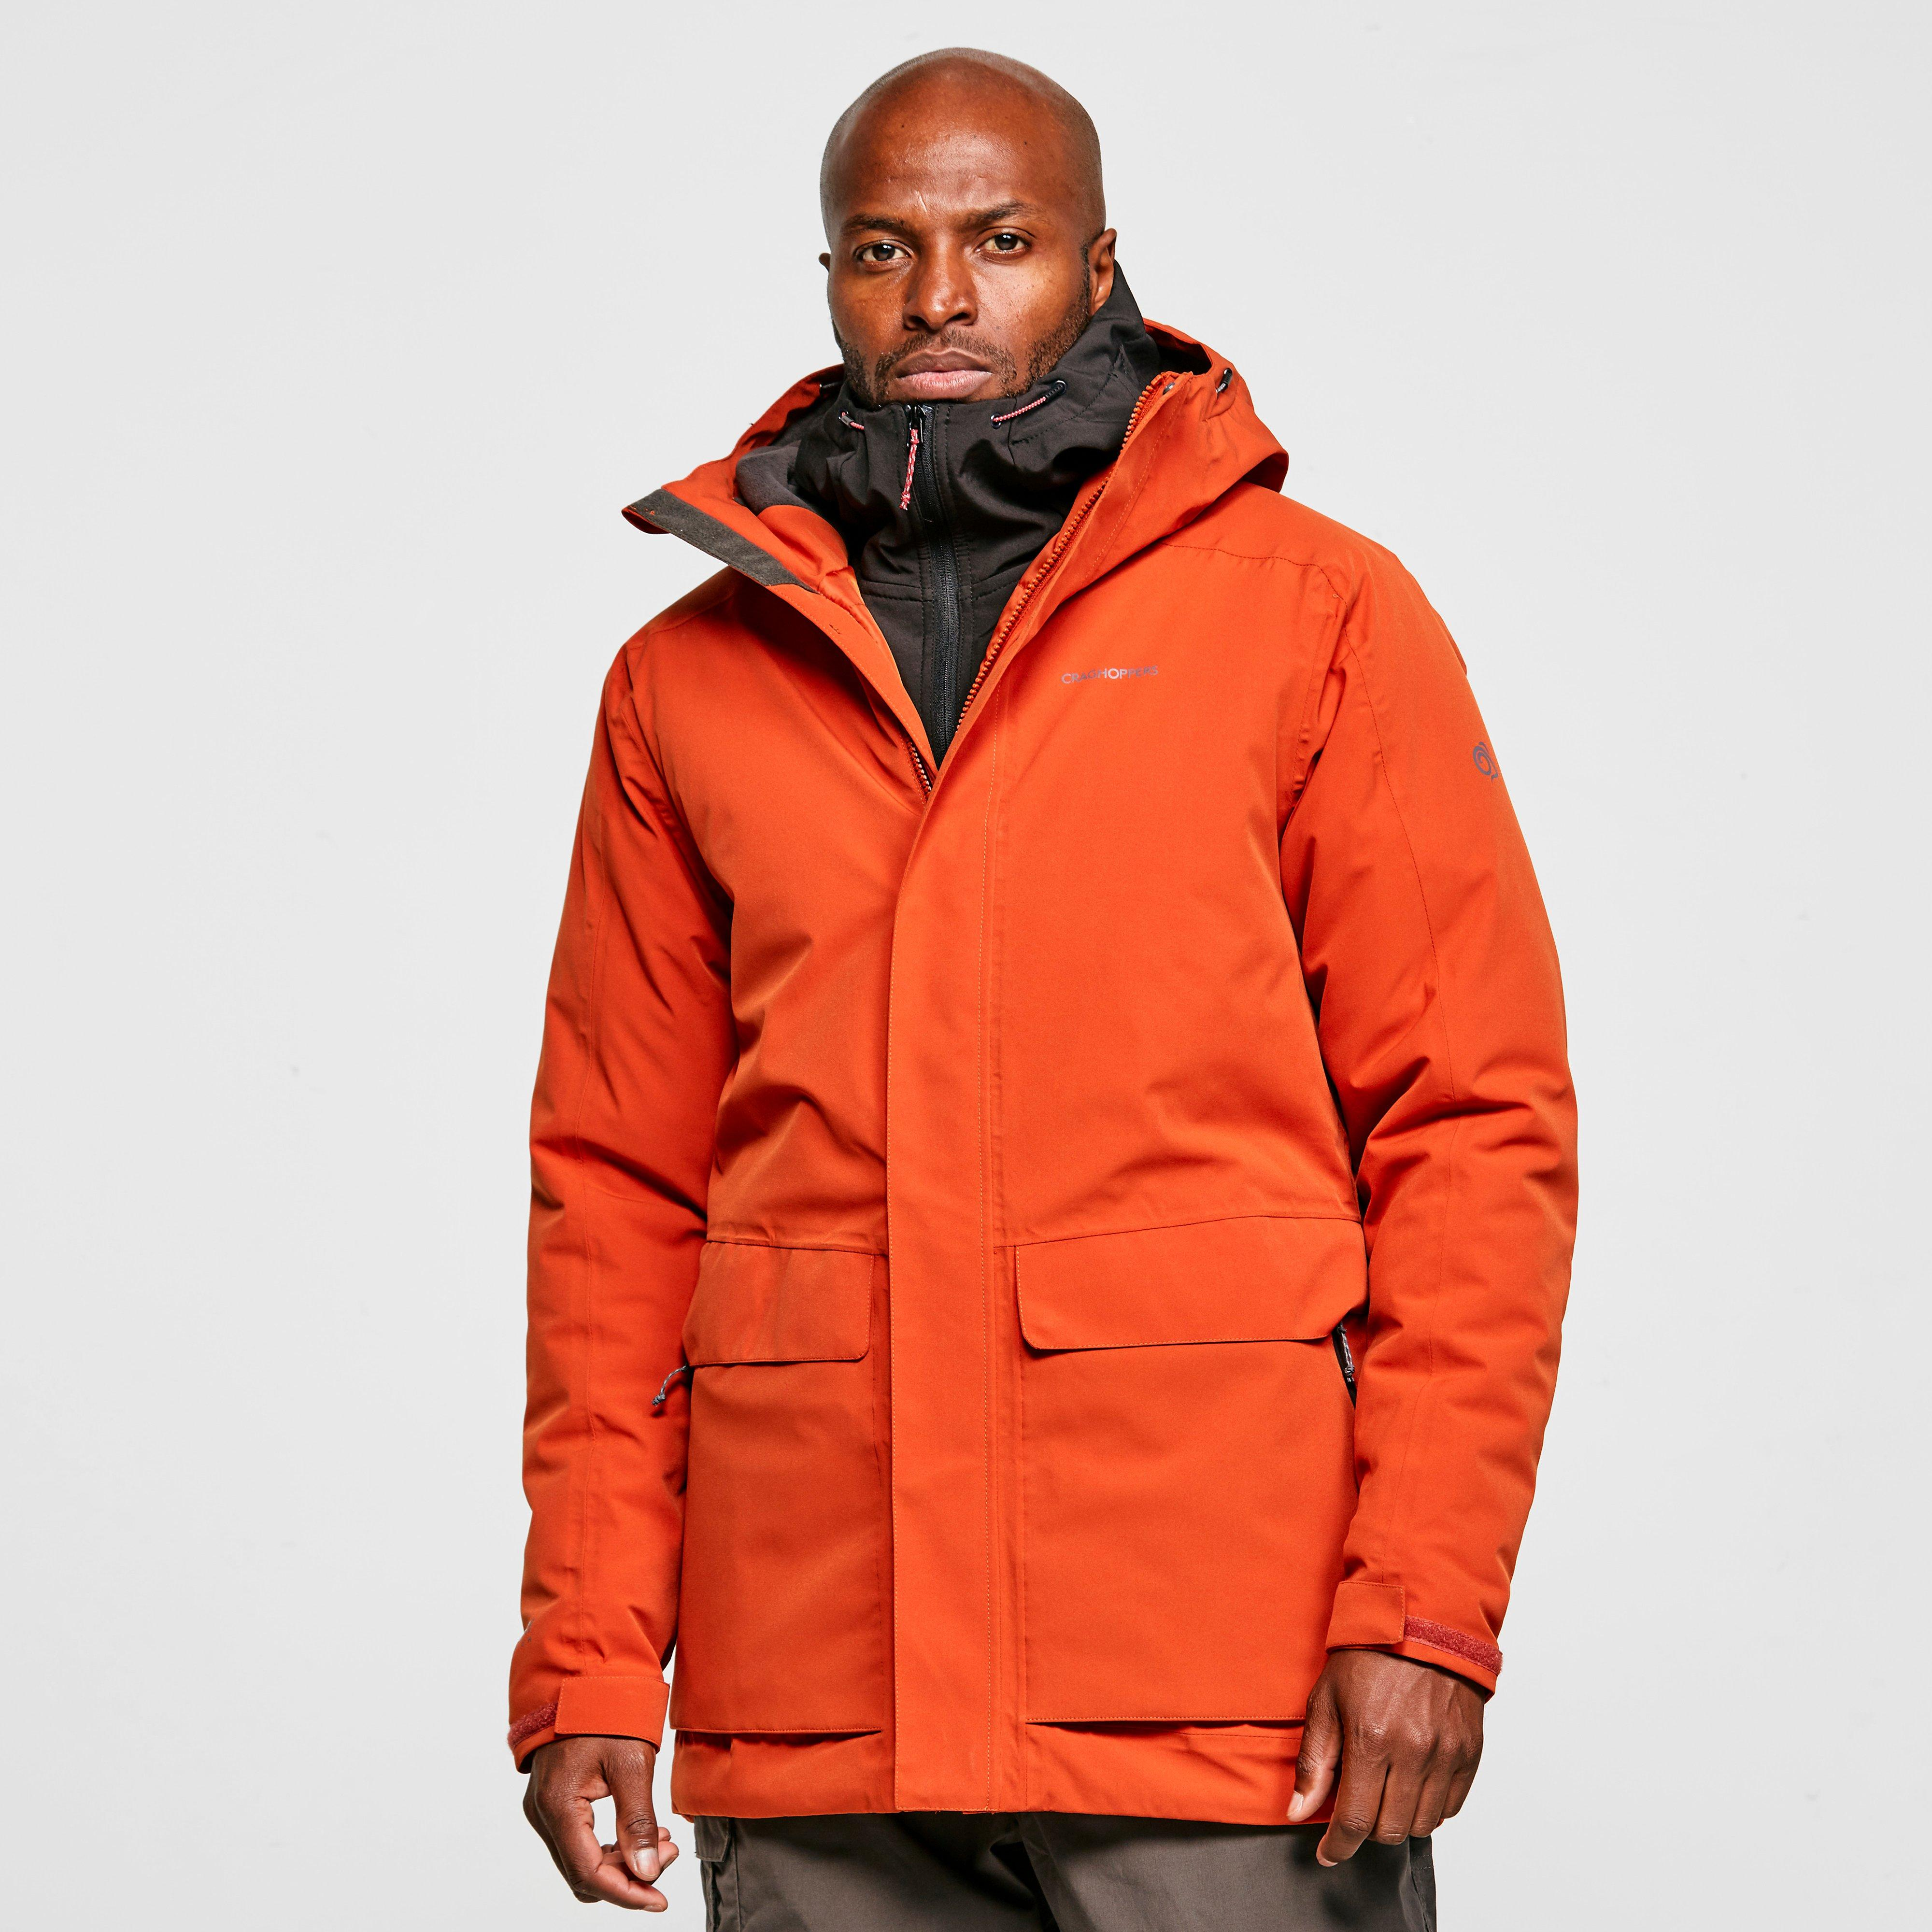 Craghoppers Men's Lorton Insulated Jacket - Orange/Org, Orange